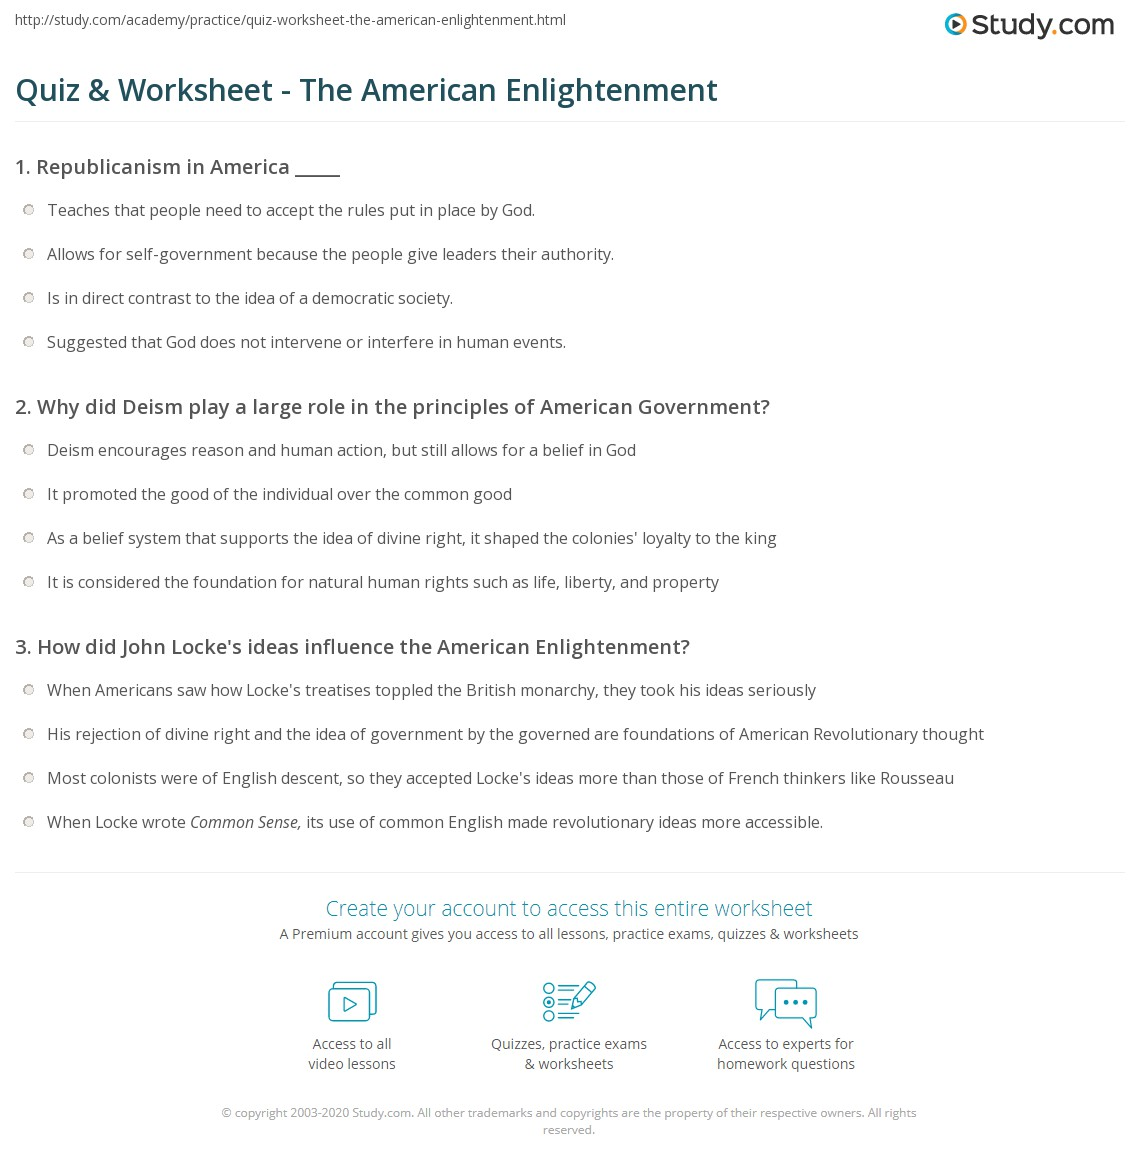 quiz worksheet the american enlightenment. Black Bedroom Furniture Sets. Home Design Ideas